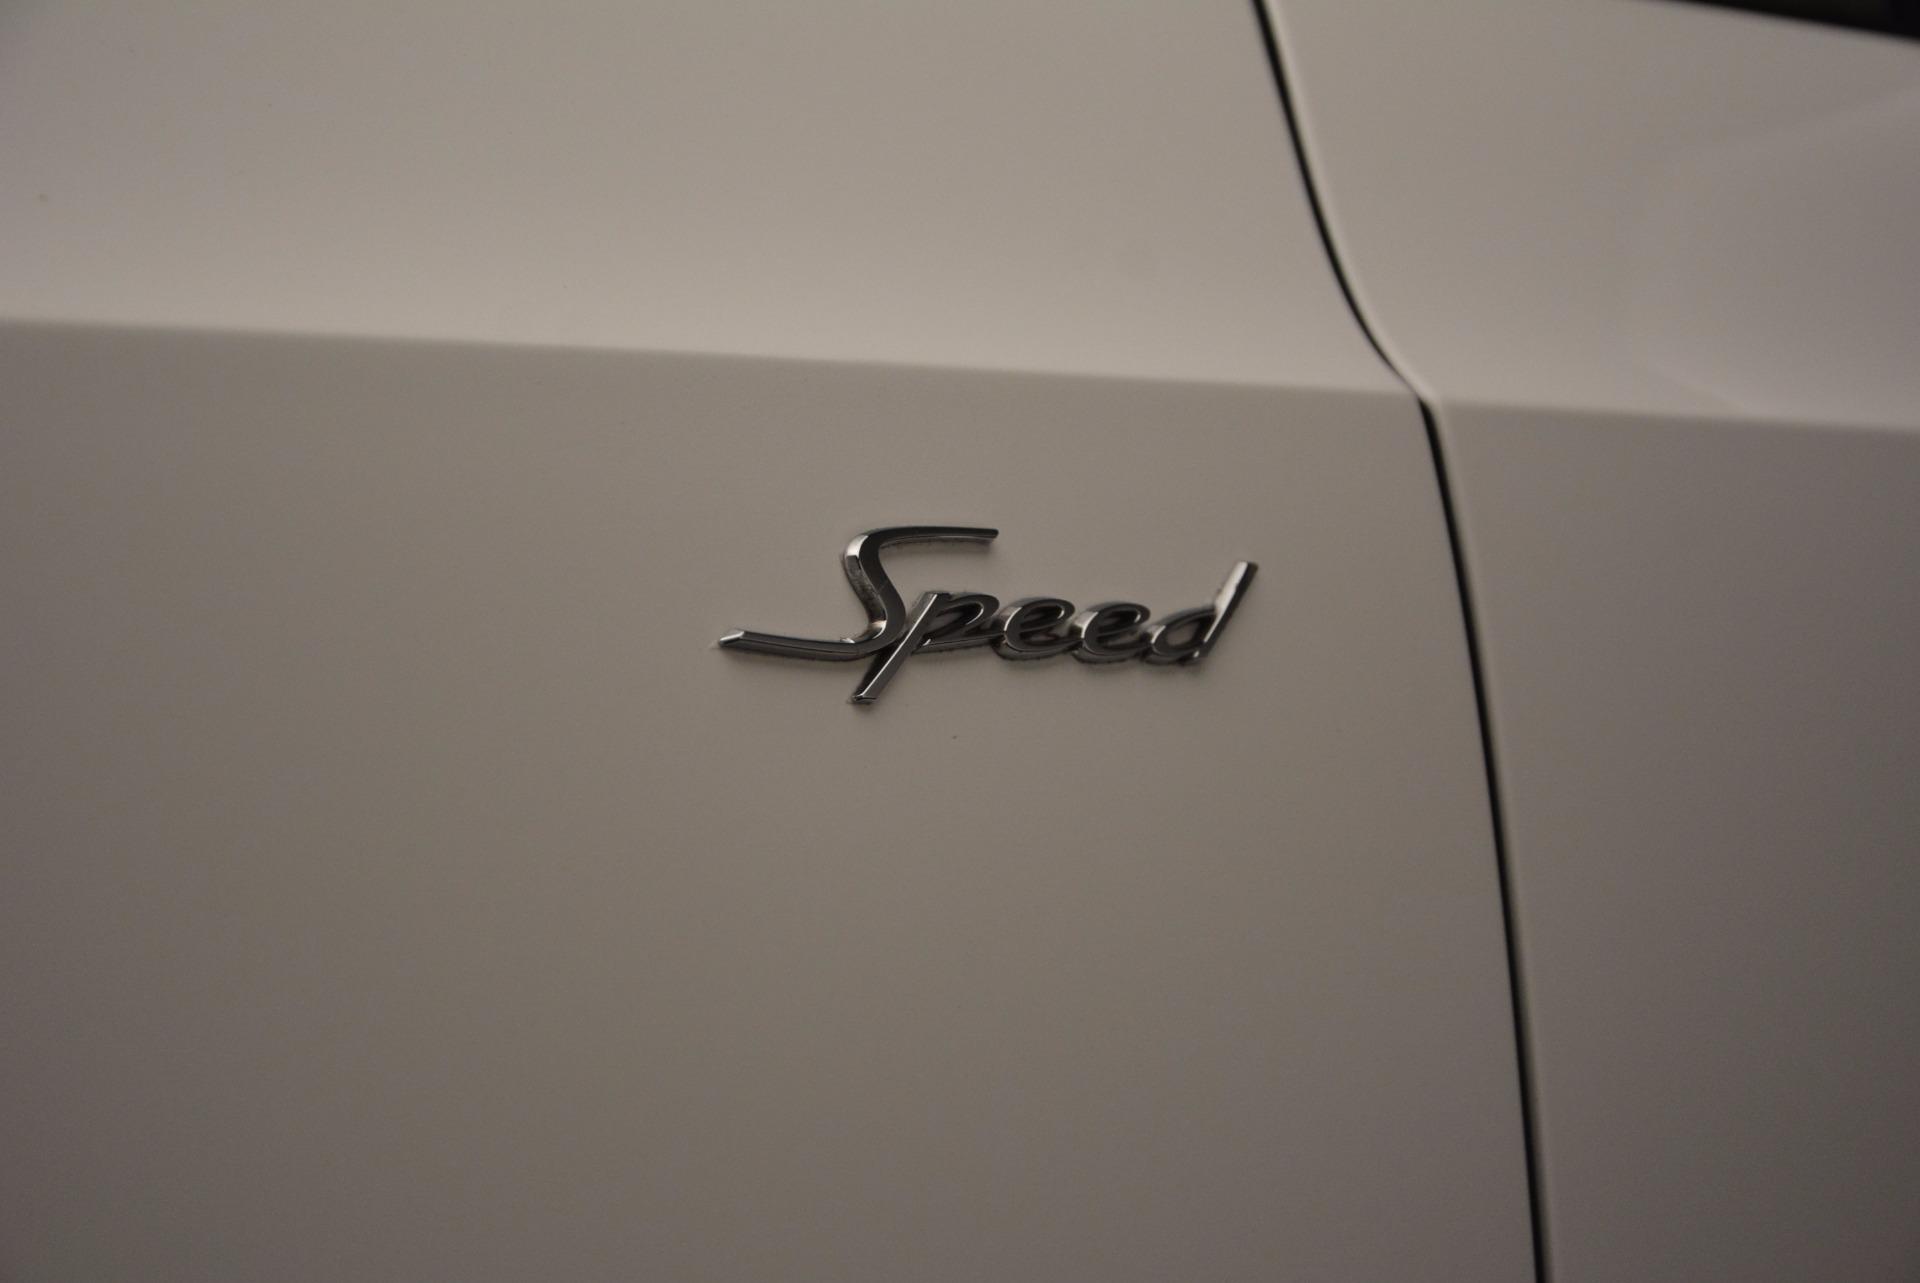 Used 2015 Bentley Continental GT Speed For Sale In Westport, CT 1714_p31